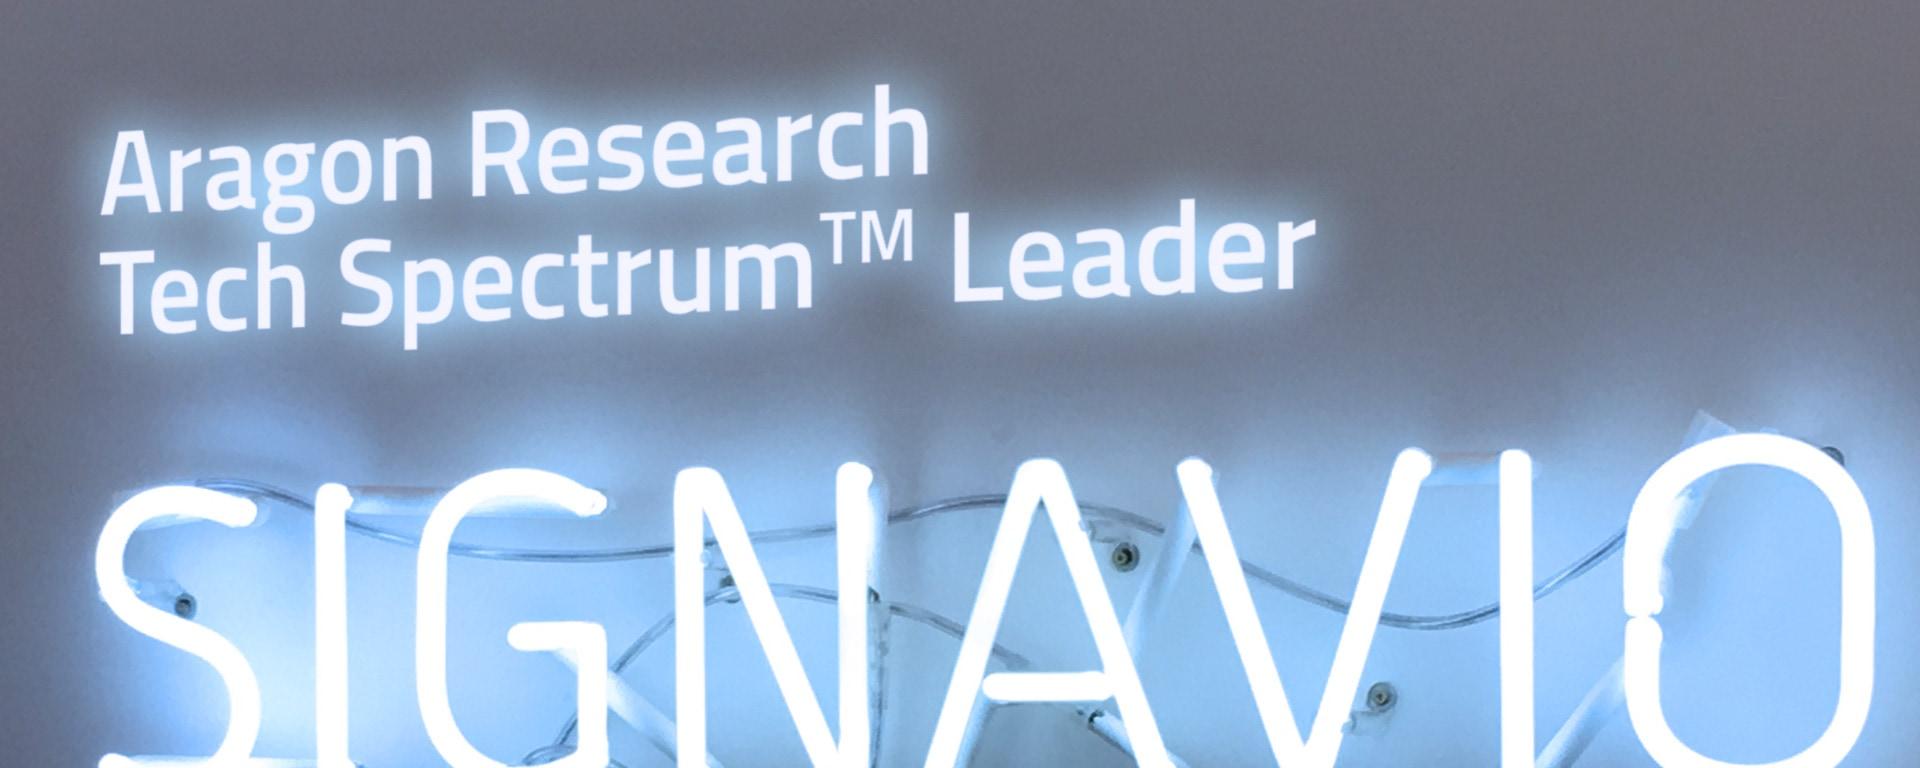 Tech Spectrum™ Leader 2019 sign